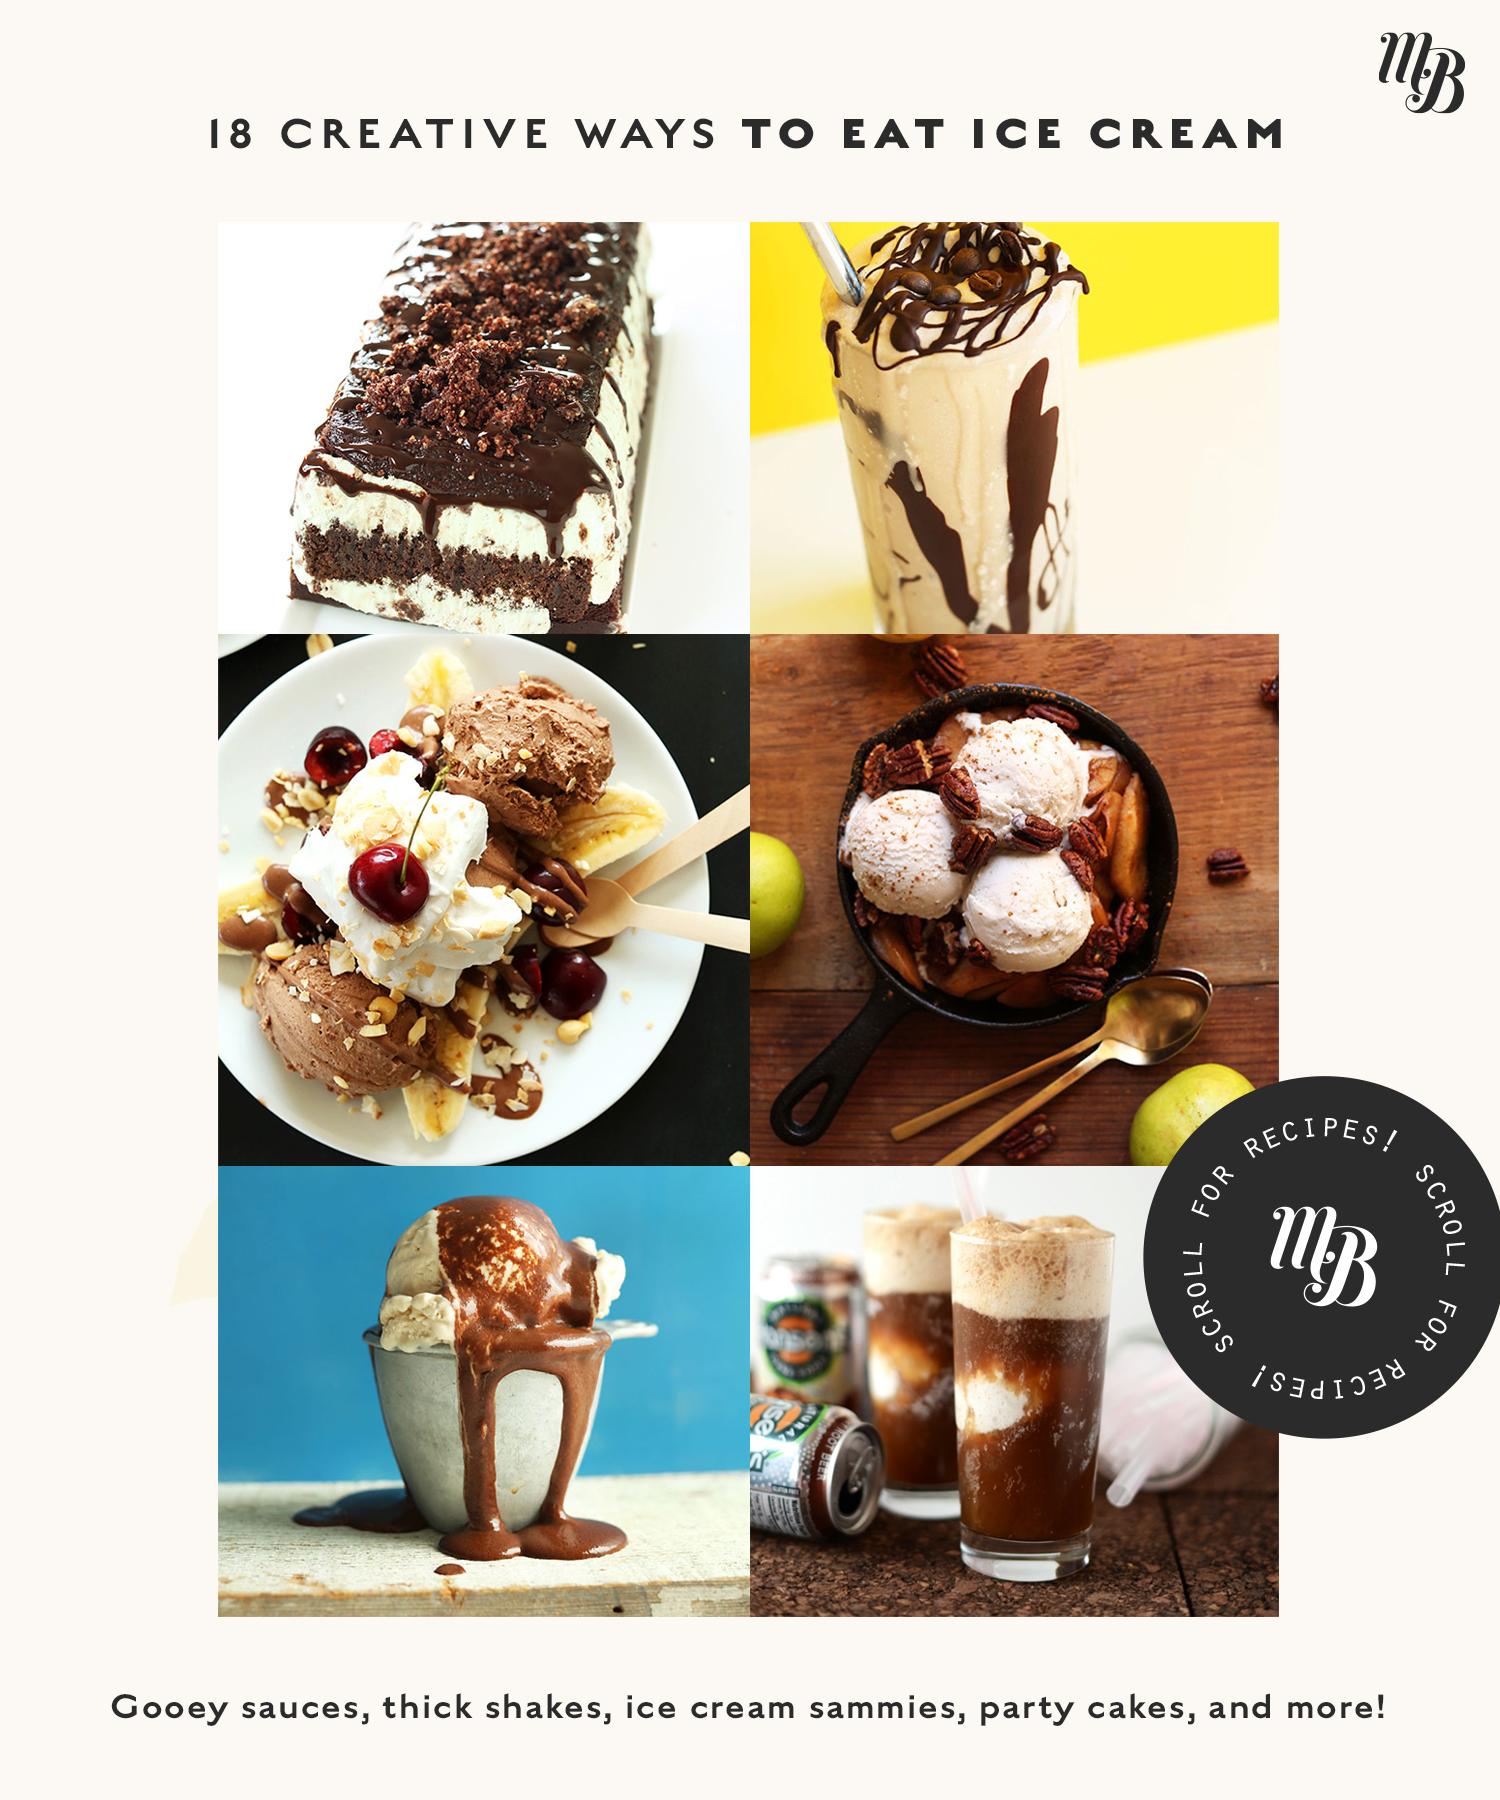 Ice cream cake, shakes, sundaes, and more fun ways to eat ice cream